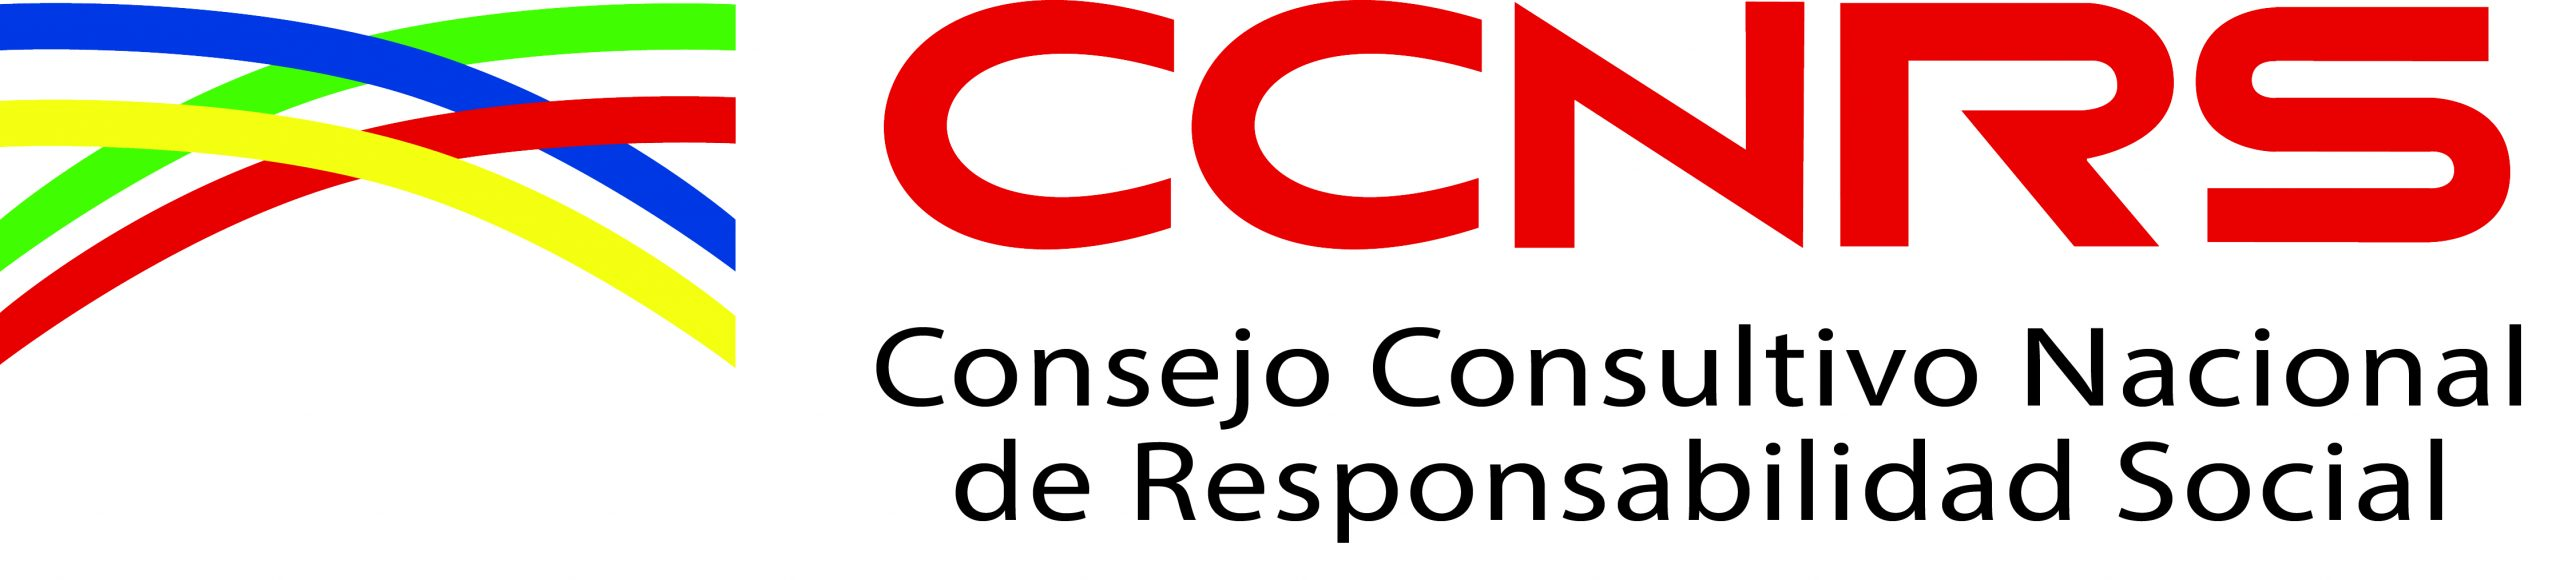 Consejo Consultivo Nacional de Responsabilidad Social – Costa Rica